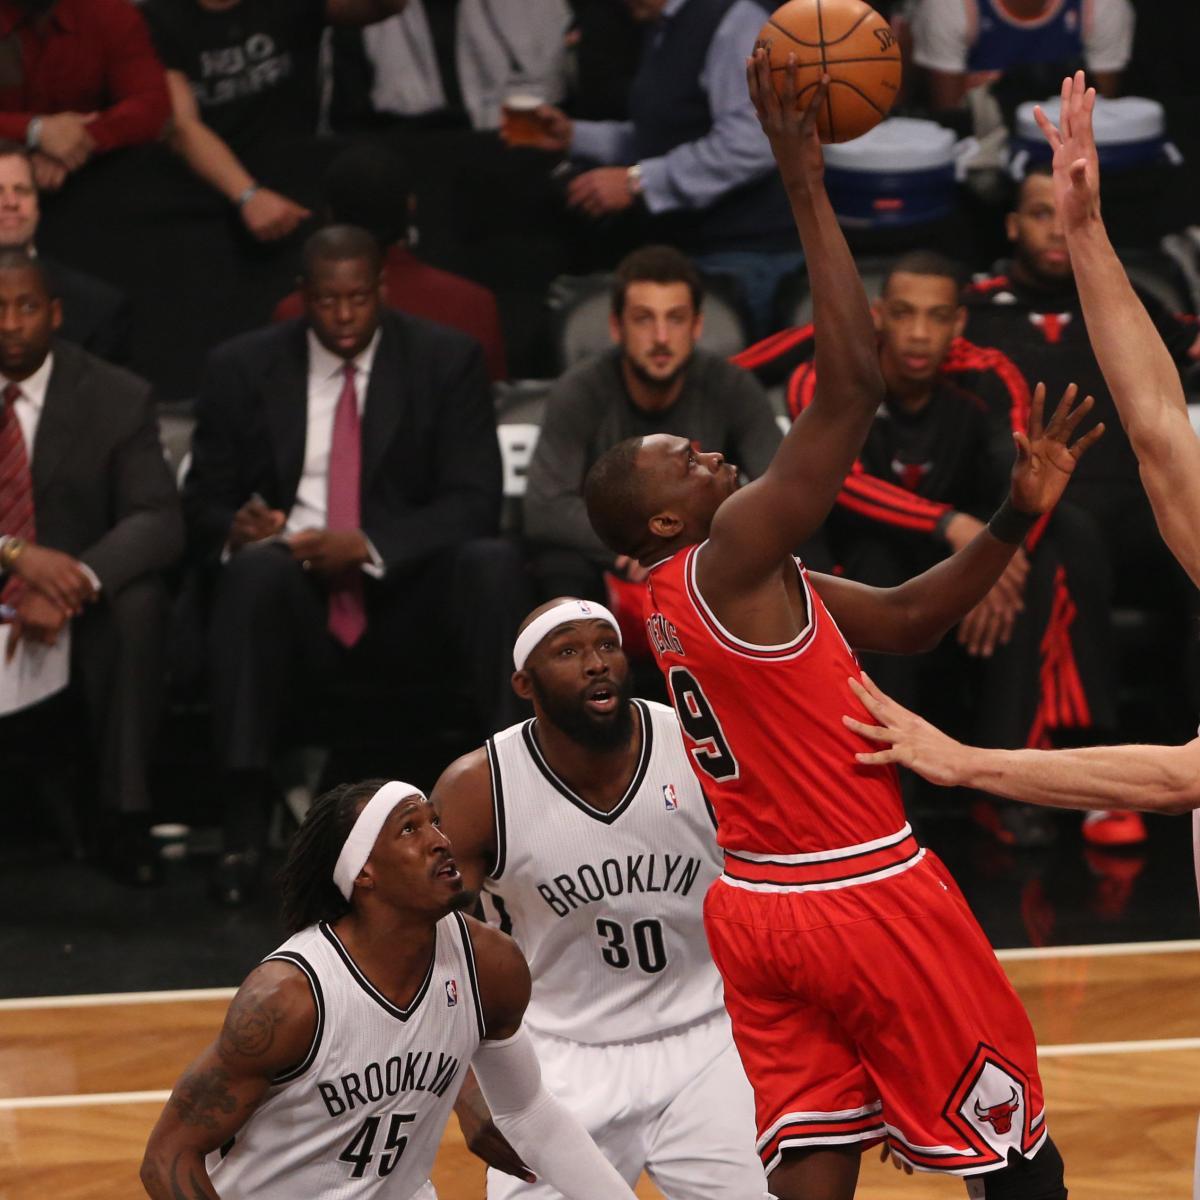 NBA Injury Report: Latest Updates On Luol Deng, Raymond